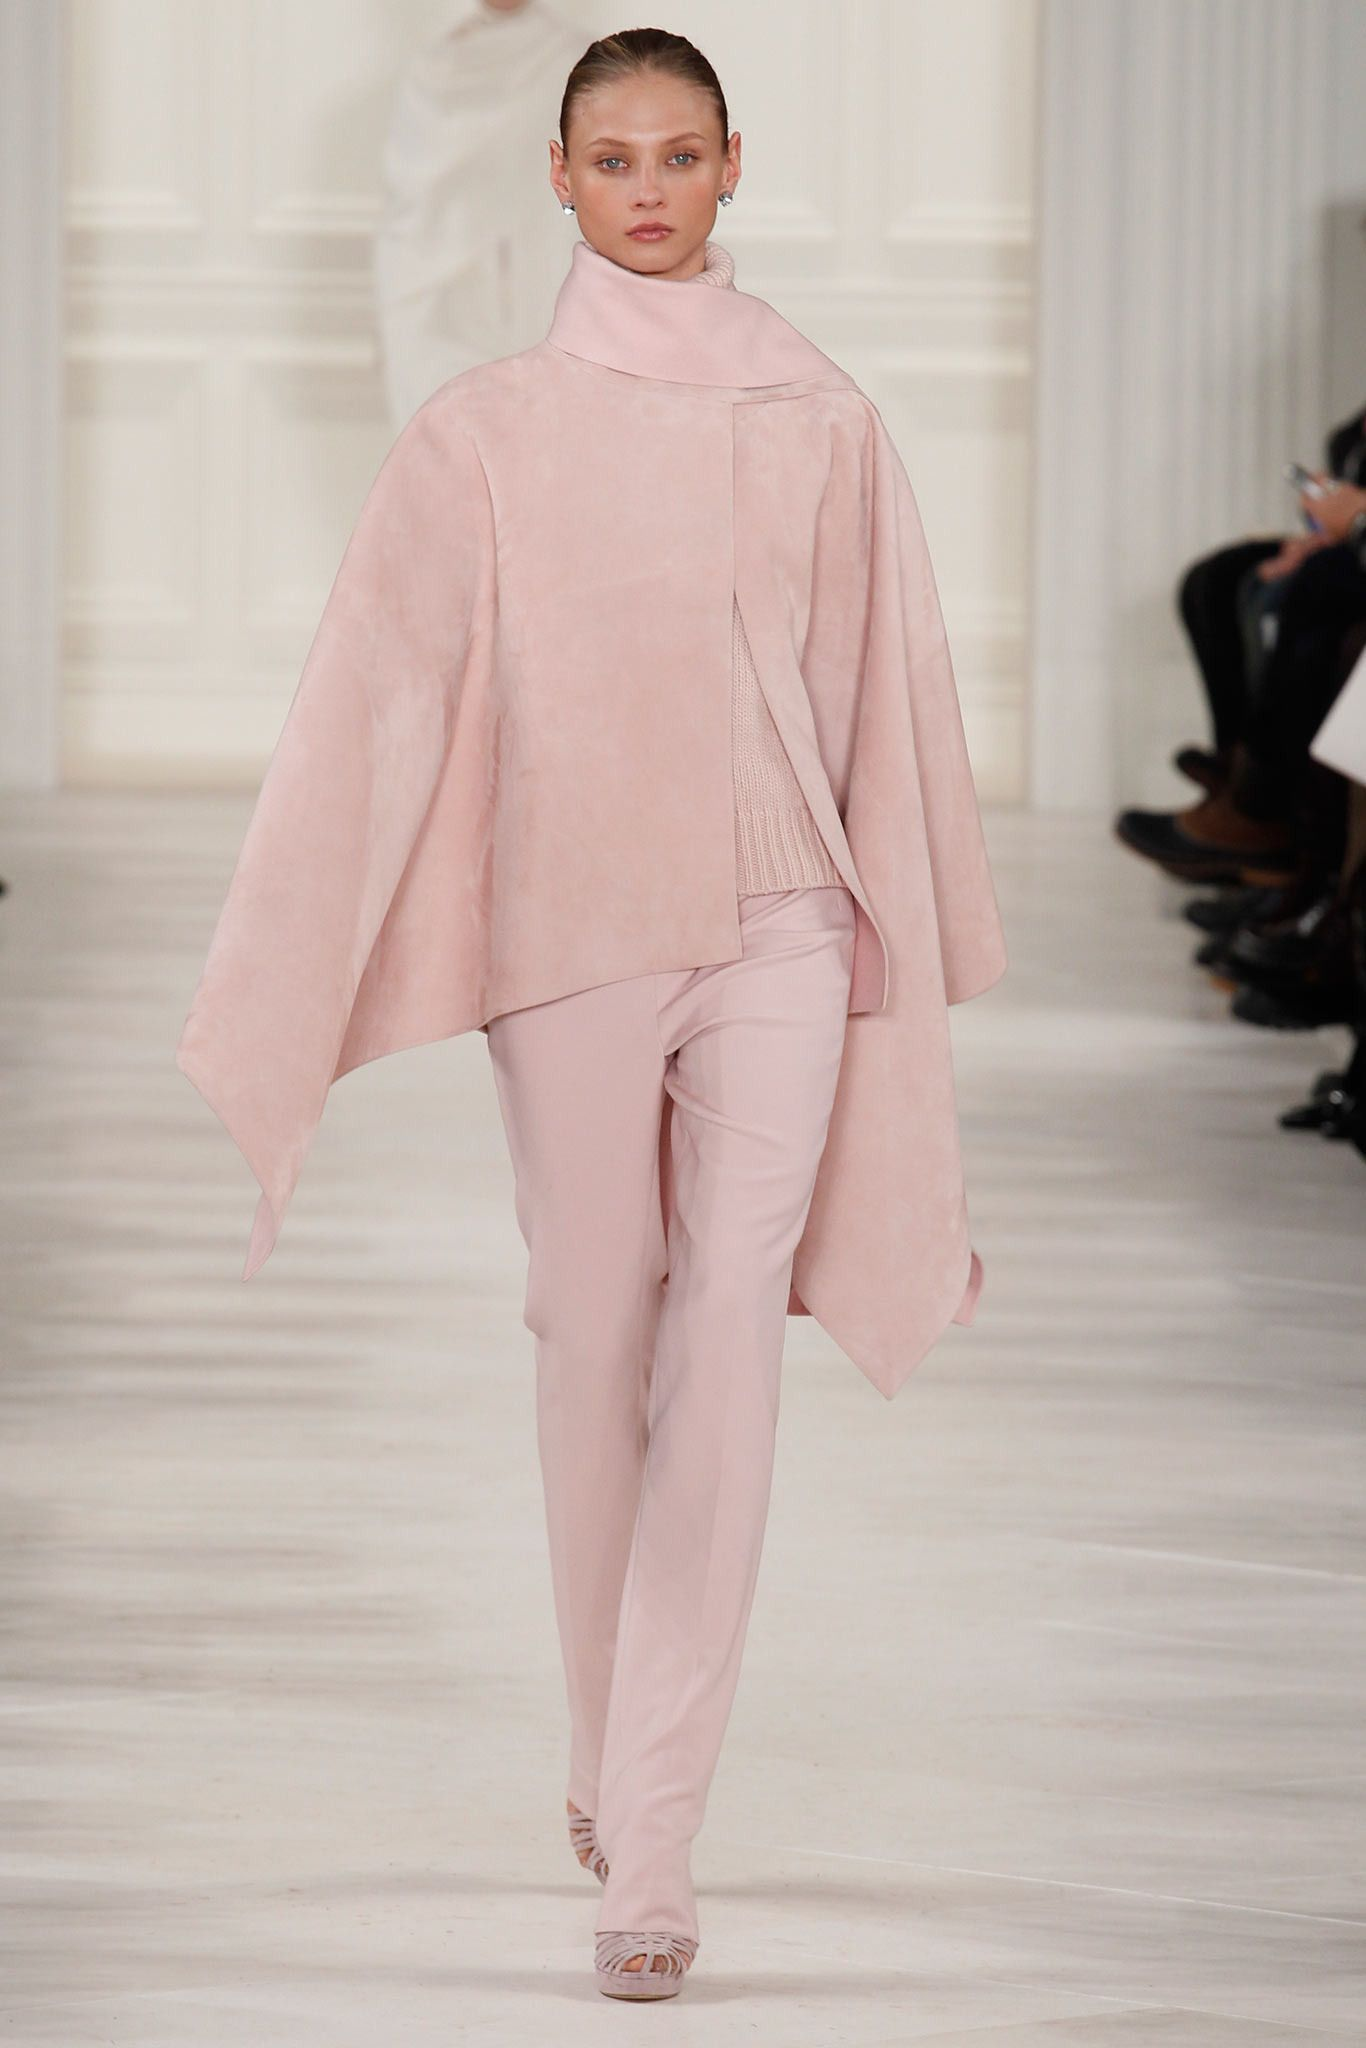 Ralph Lauren | Pretty in pink | Pinterest | Pintas, Vestimentas y ...